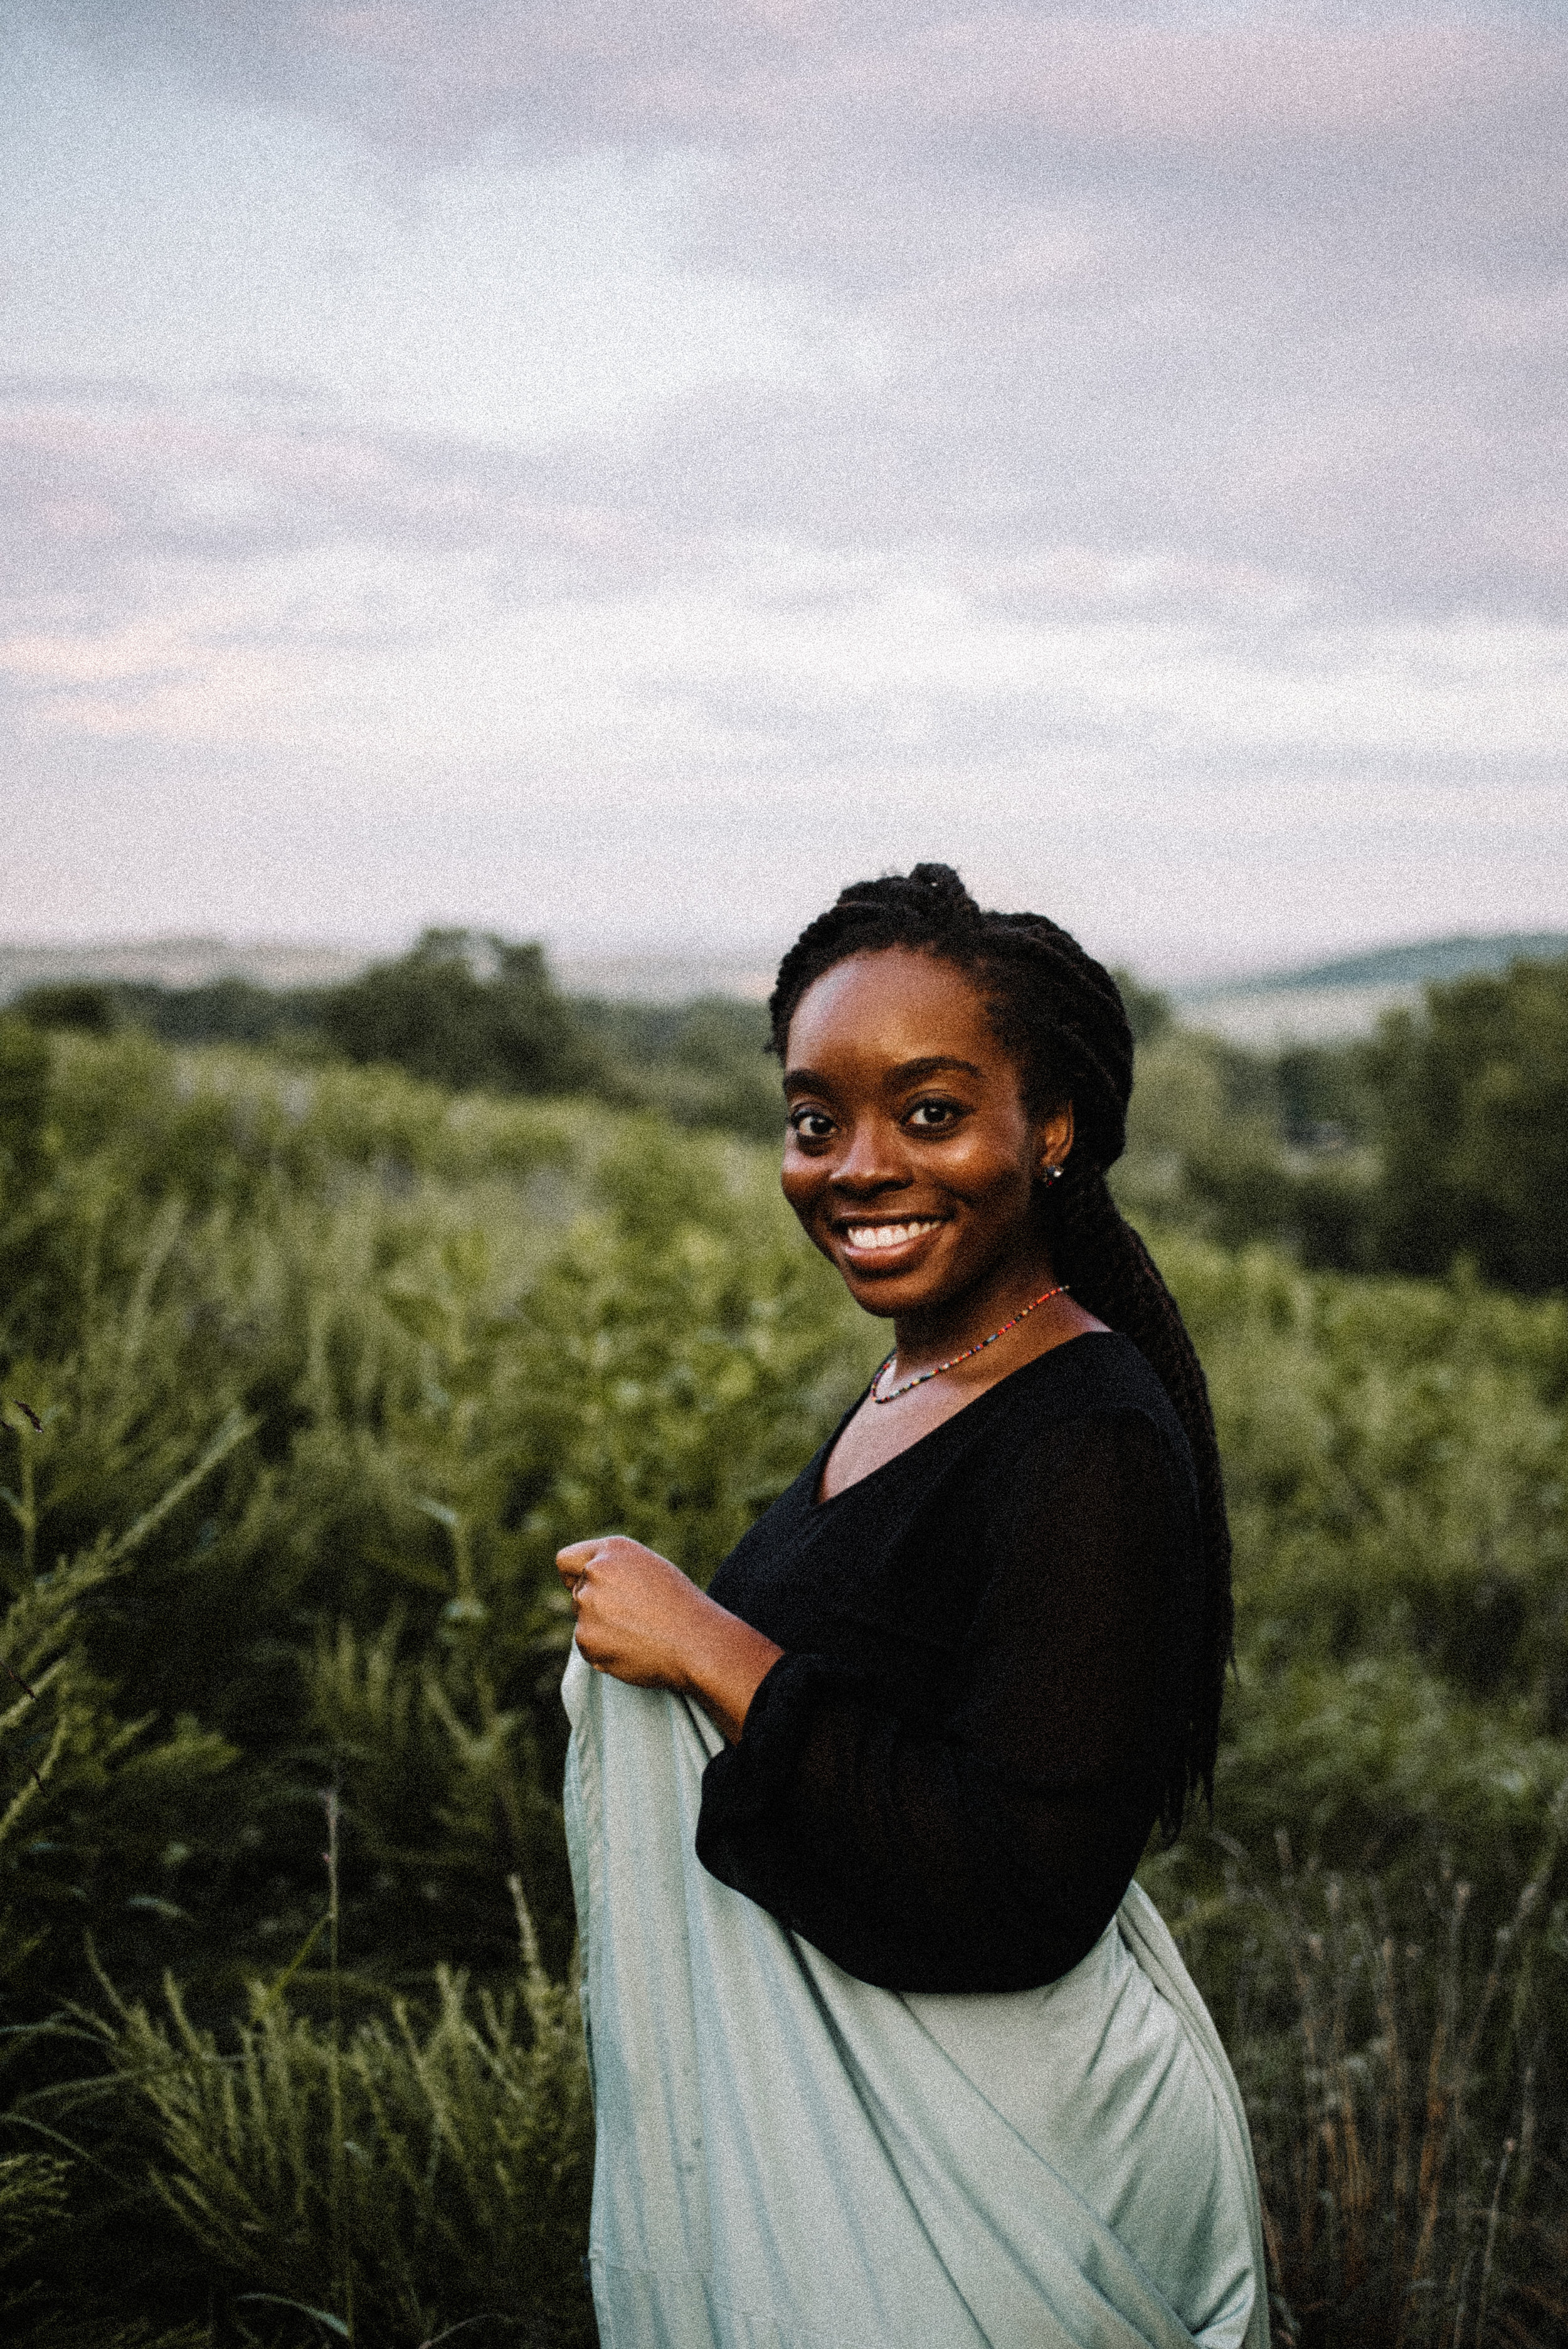 Mercy - White Sails Photography - adventure portraits - sky meadows state park 25.JPG